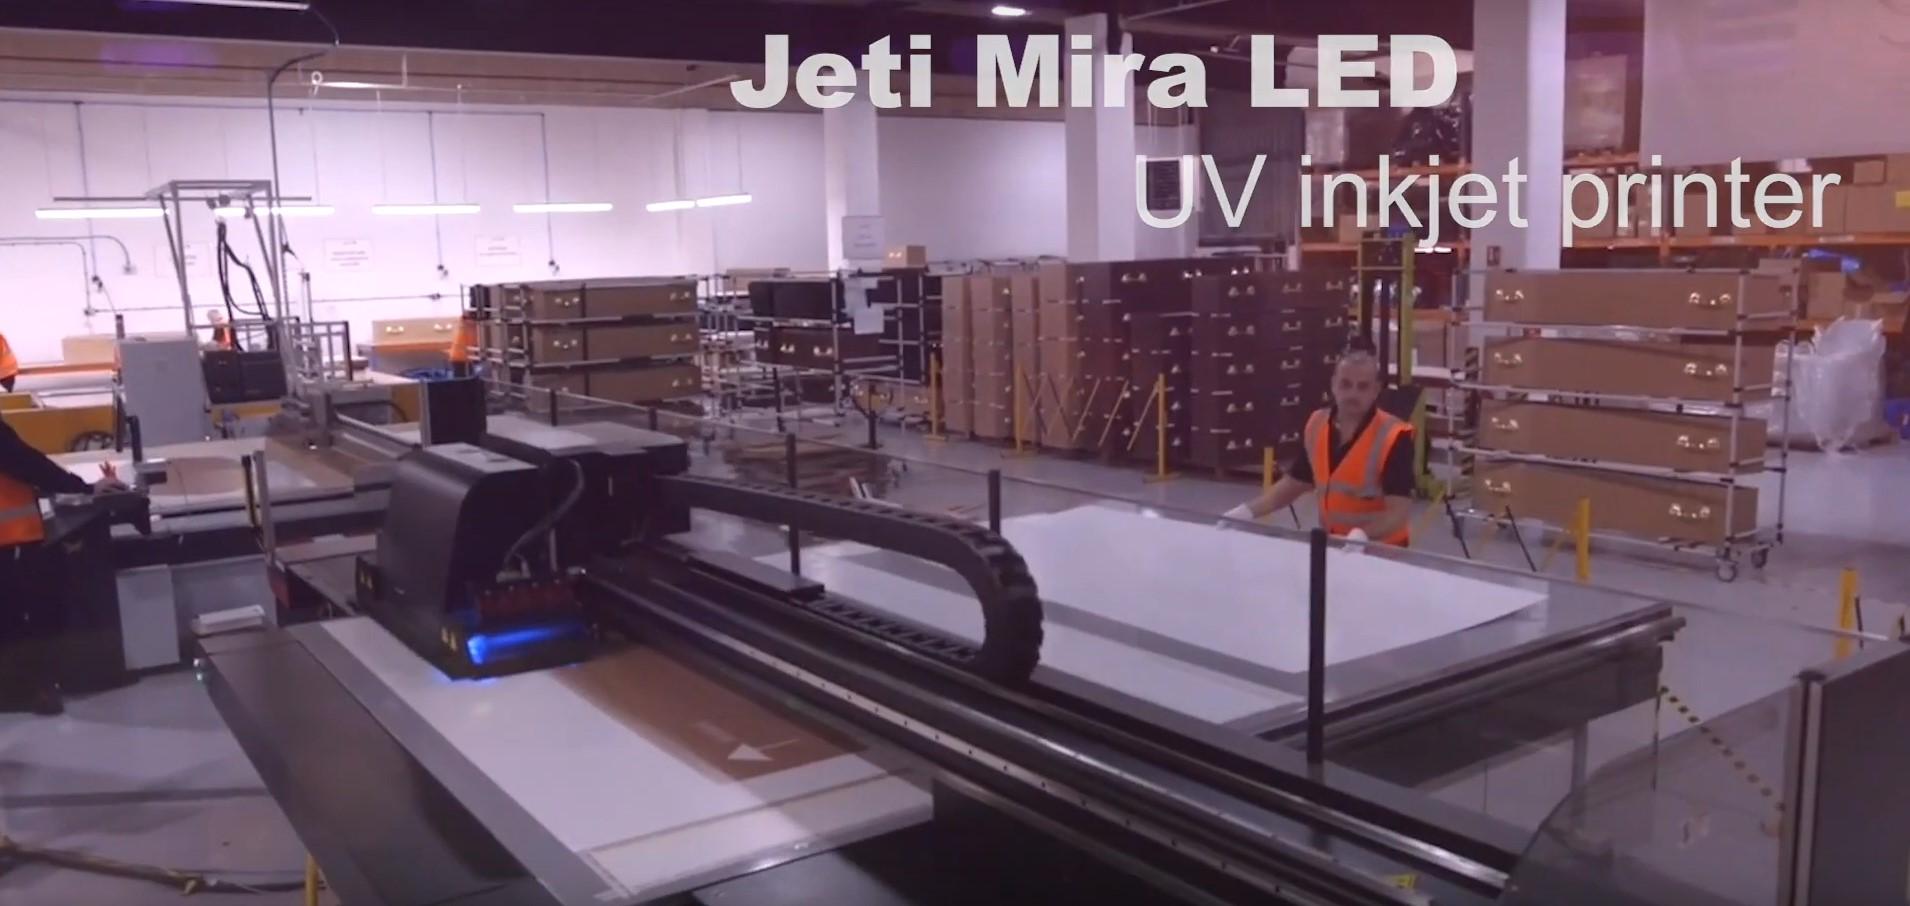 Impresión de ataúdes con tecnología de inyección de tinta